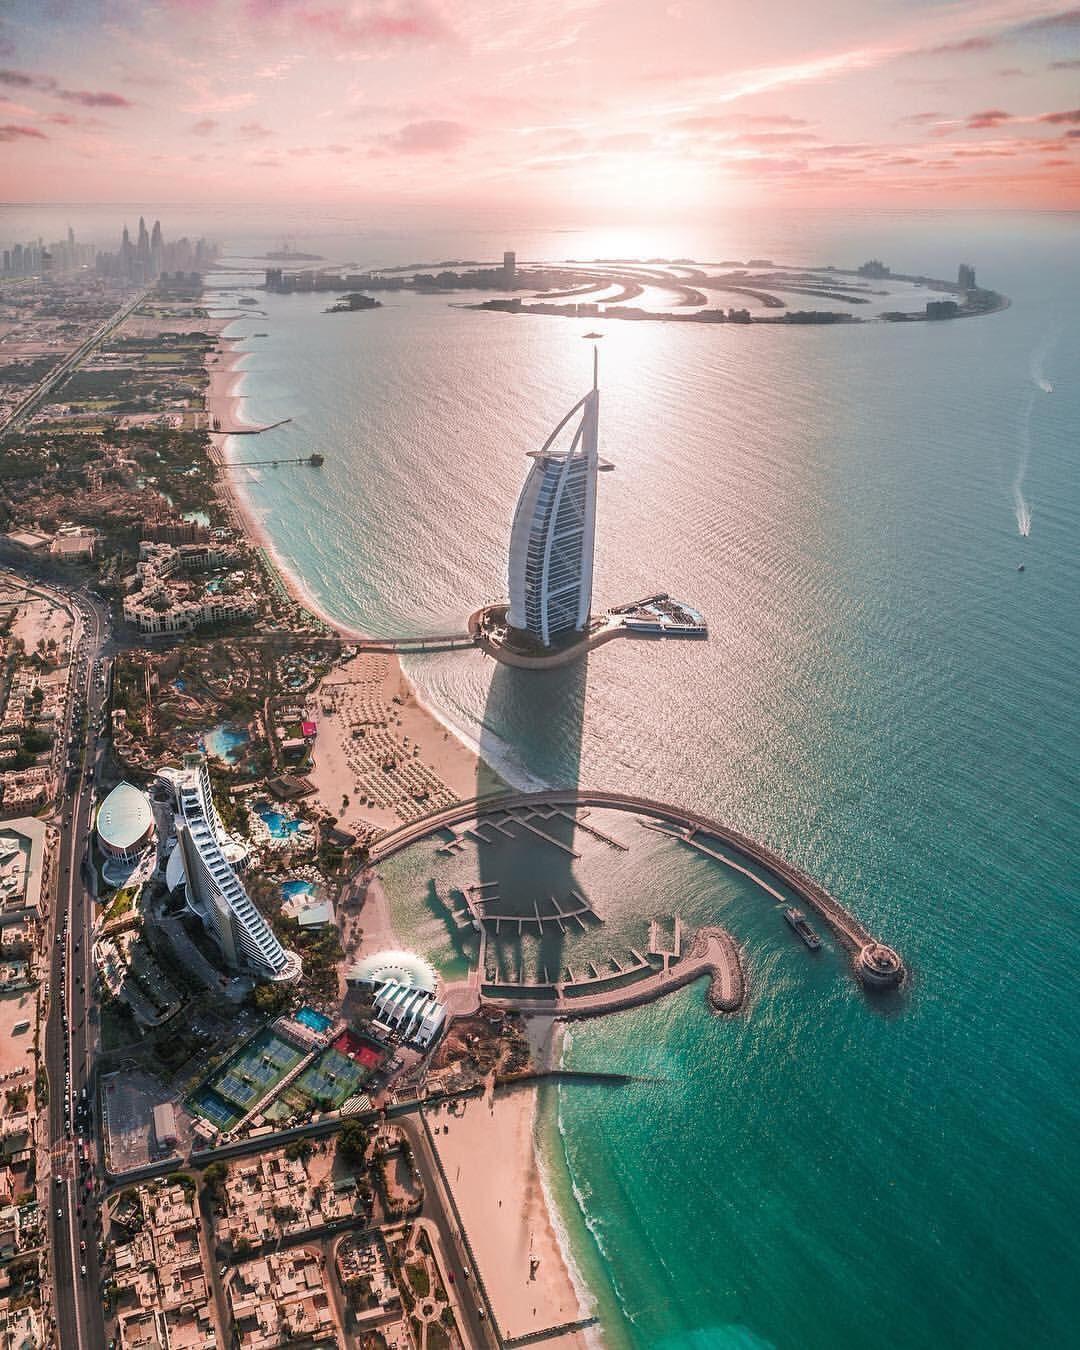 Vacations Travel Nature Sur Instagram Follow Planetfervor Aerial View Dubai United Arab Emirates Photo By Dubai Travel Dubai Vacation Visit Dubai